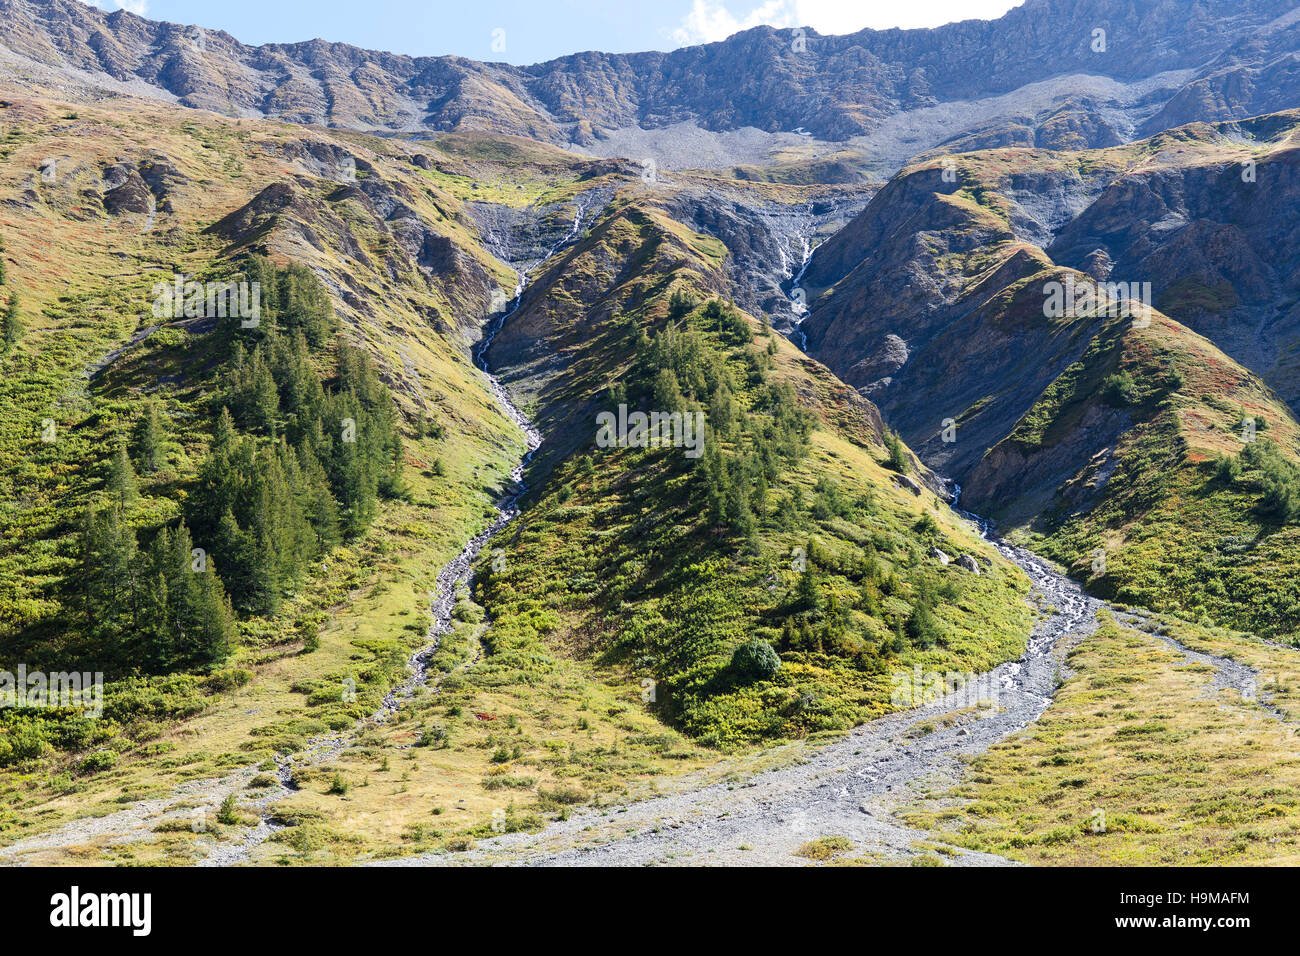 Val Veny Valle d'Aosta Italy rocks trees creeks green sky blue summer travel nature - Stock Image